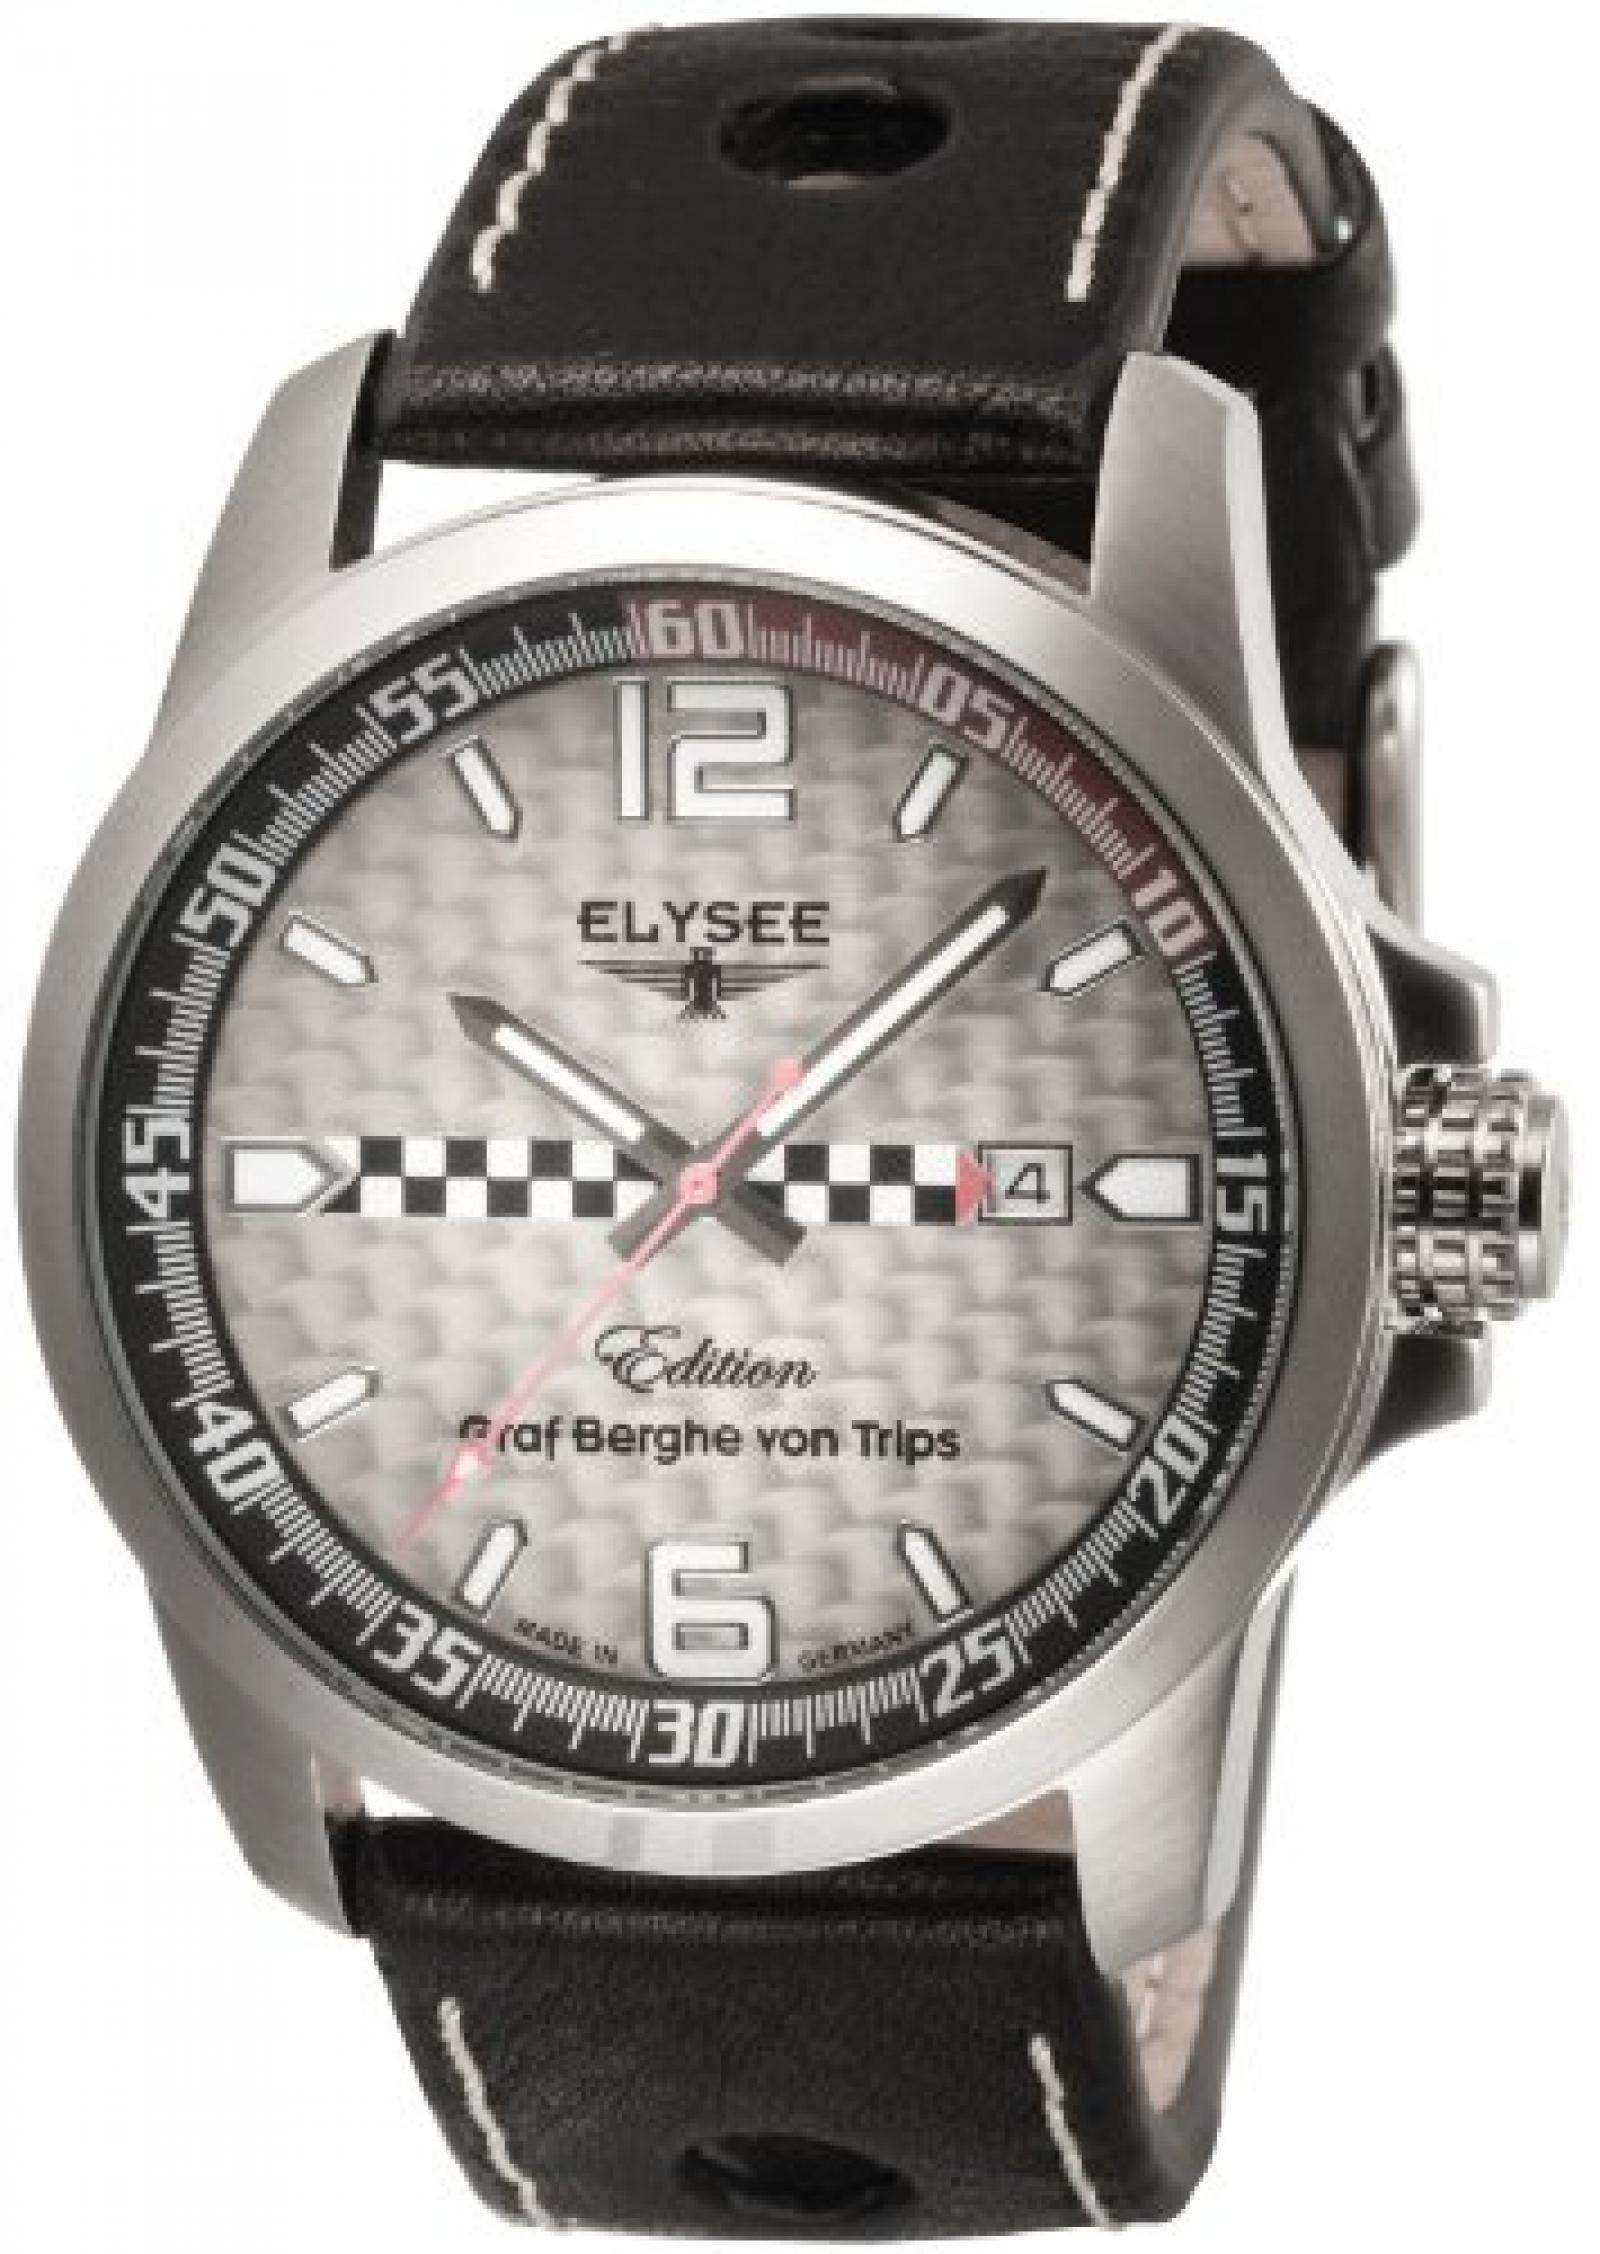 Elysee Herren-Armbanduhr Graf Berghe von Trips 80464